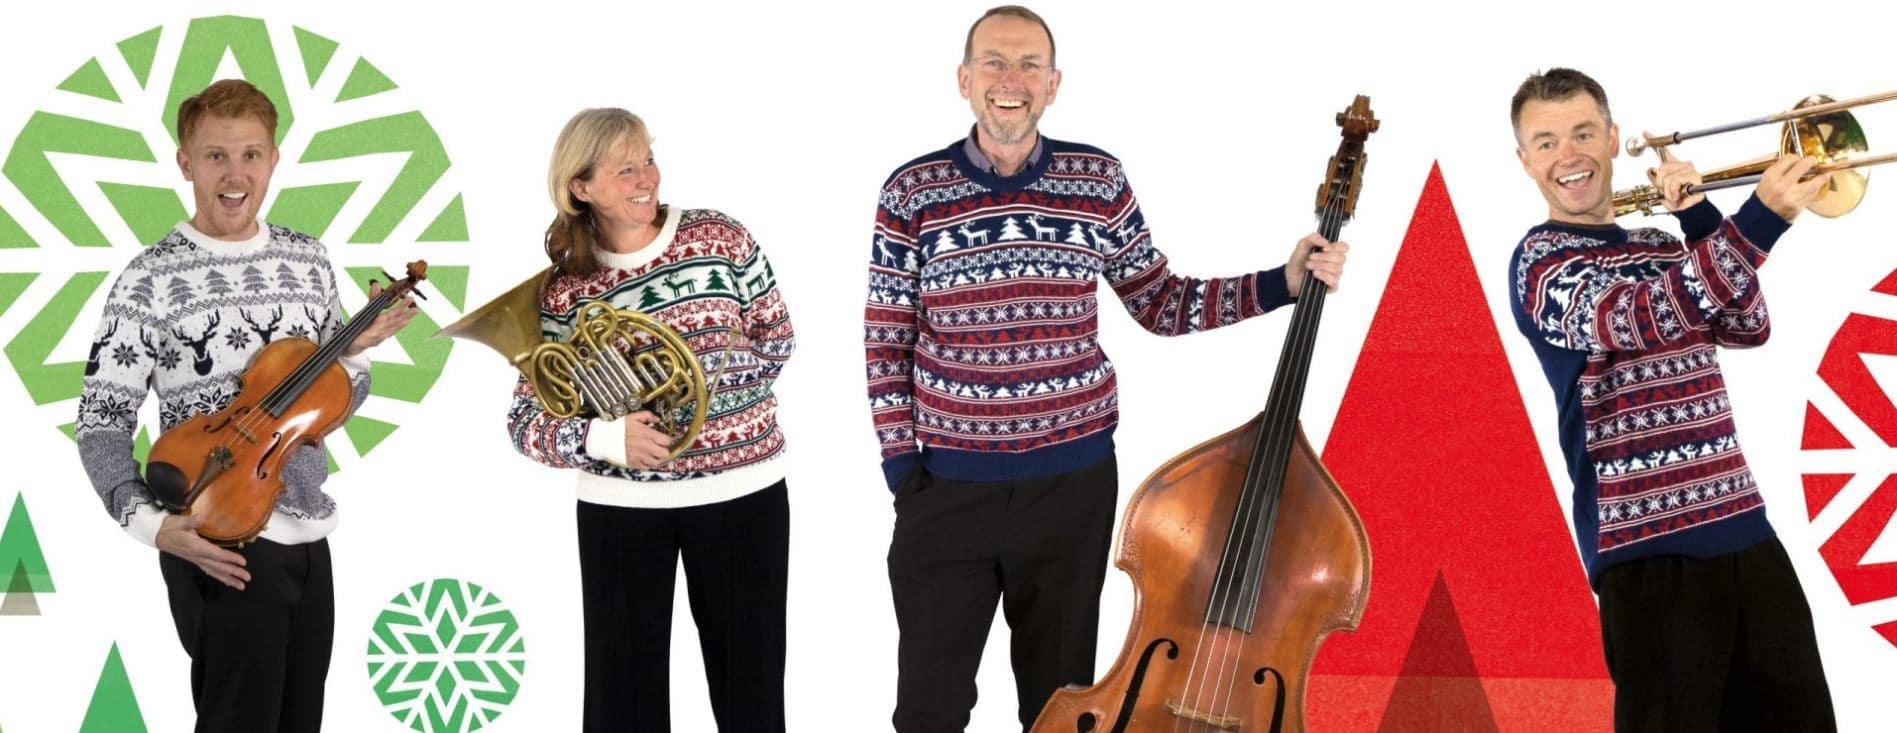 Bournemouth Symphony Orchestra: Christmas Crackers 2021 - Bournemouth Symphony Orchestra